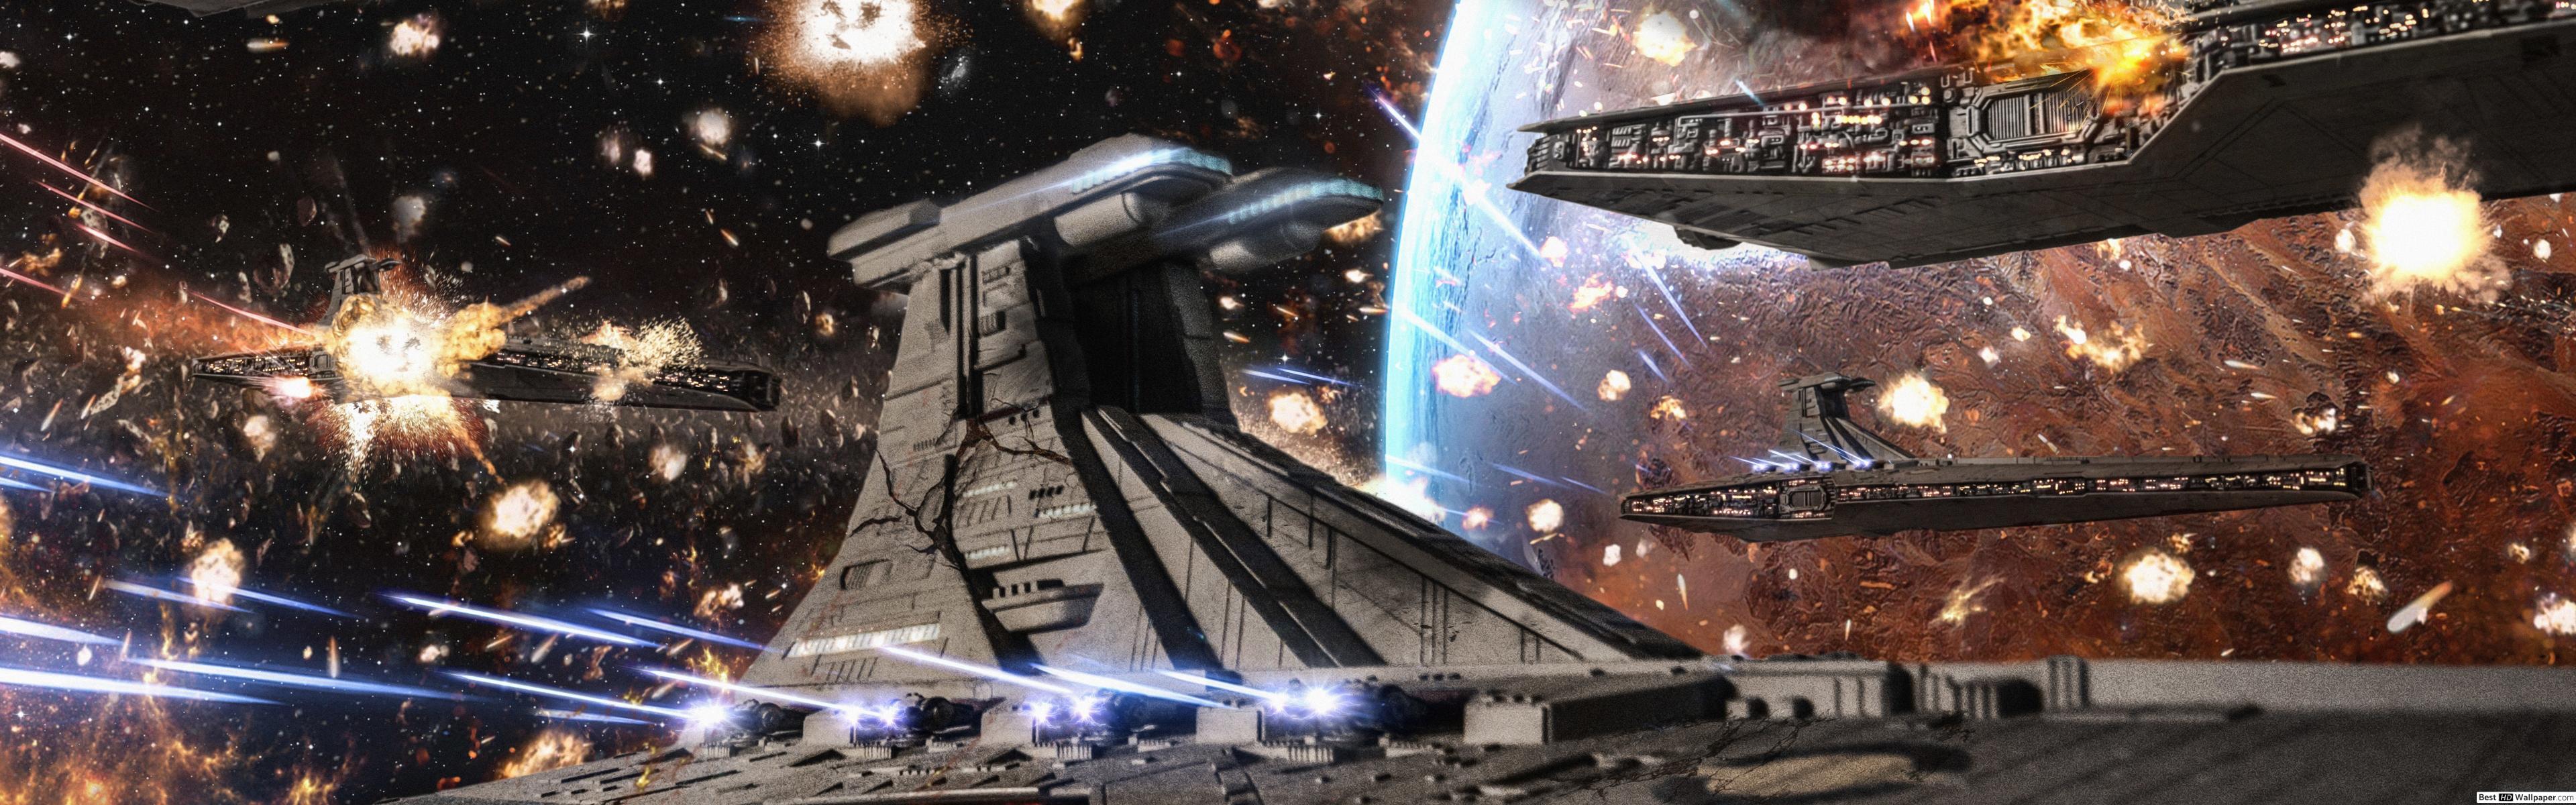 Star Wars Ship Wallpaper Hd 3840x1200 Wallpaper Teahub Io